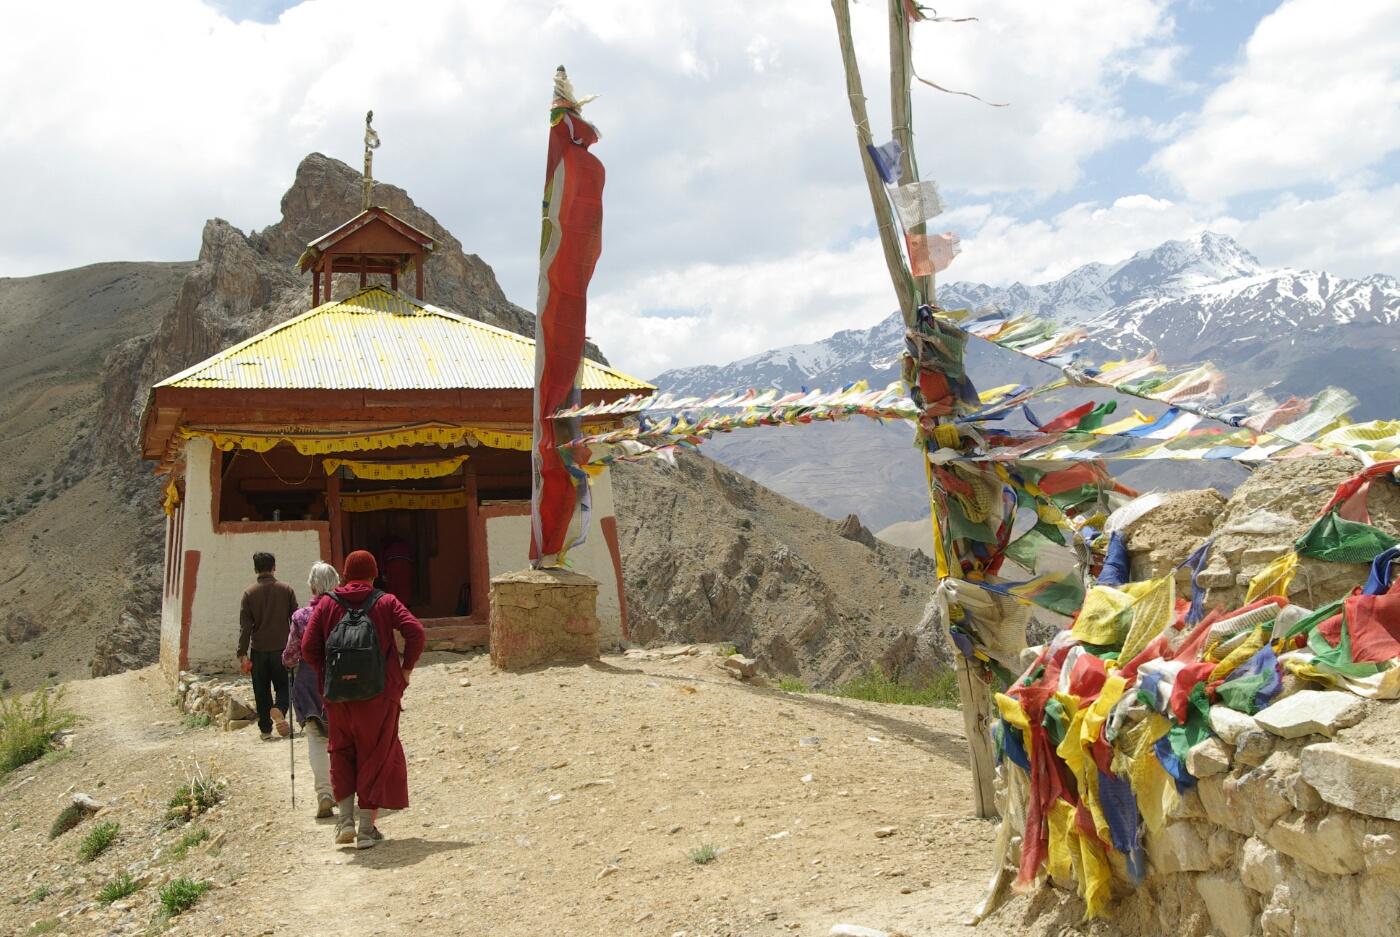 Phokar, Padmasambhava: Kleiner Tempel auf dem Hügel